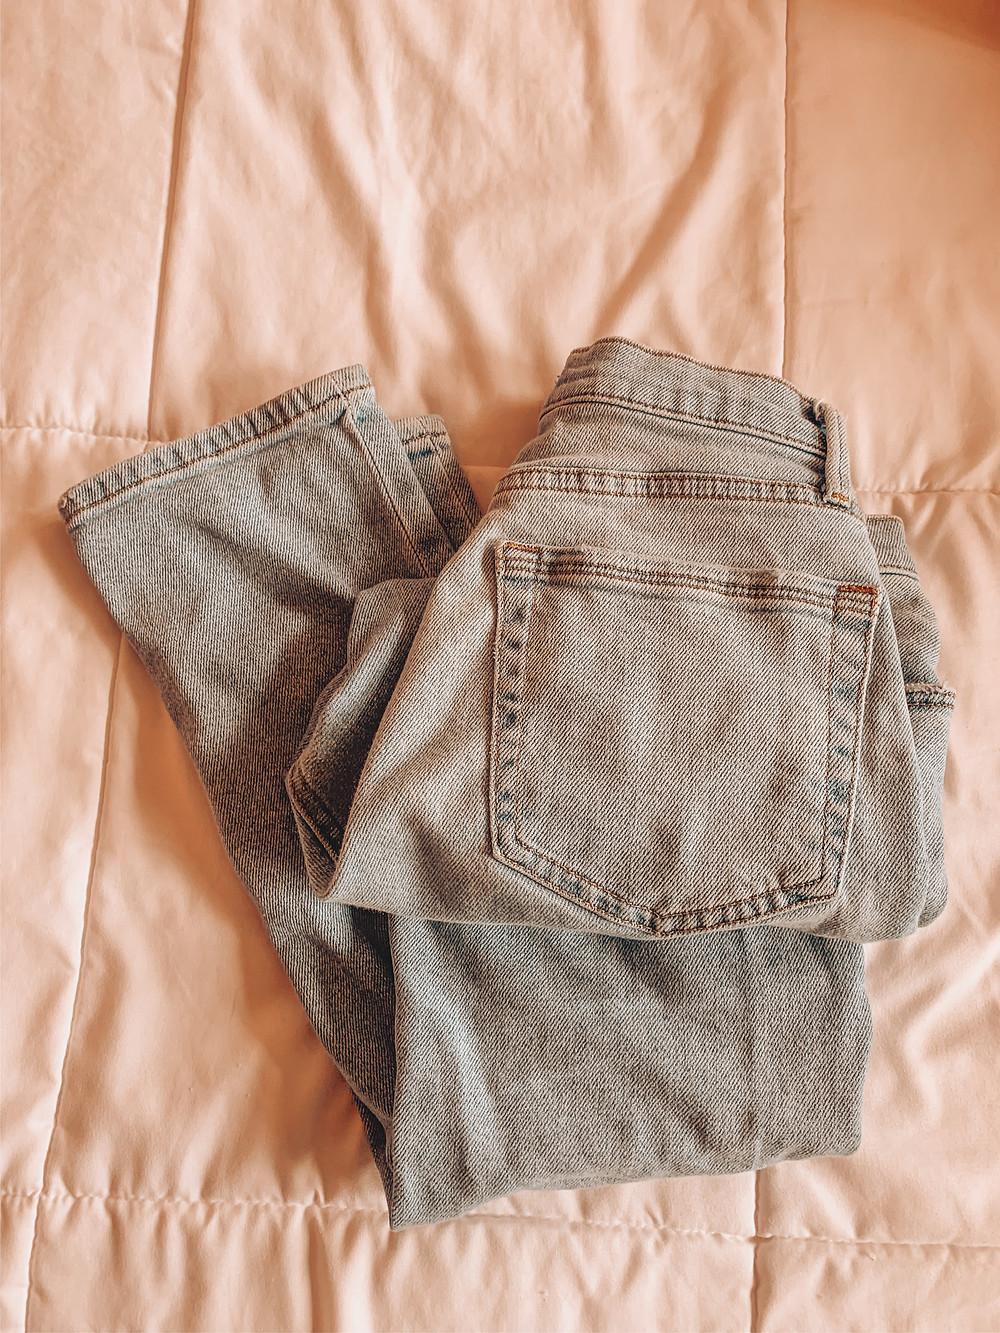 Quarantine, COVID-19, Coronavirus, beauty, health, skincare, jeans, mom jeans, boyfriend jeans, Philosophy, perfume, Ember Mug, Ember, Temperature Matters, orange blanket, copper mug, white blanket, ZO Skin Health, Anastasia Beverly Hills palette